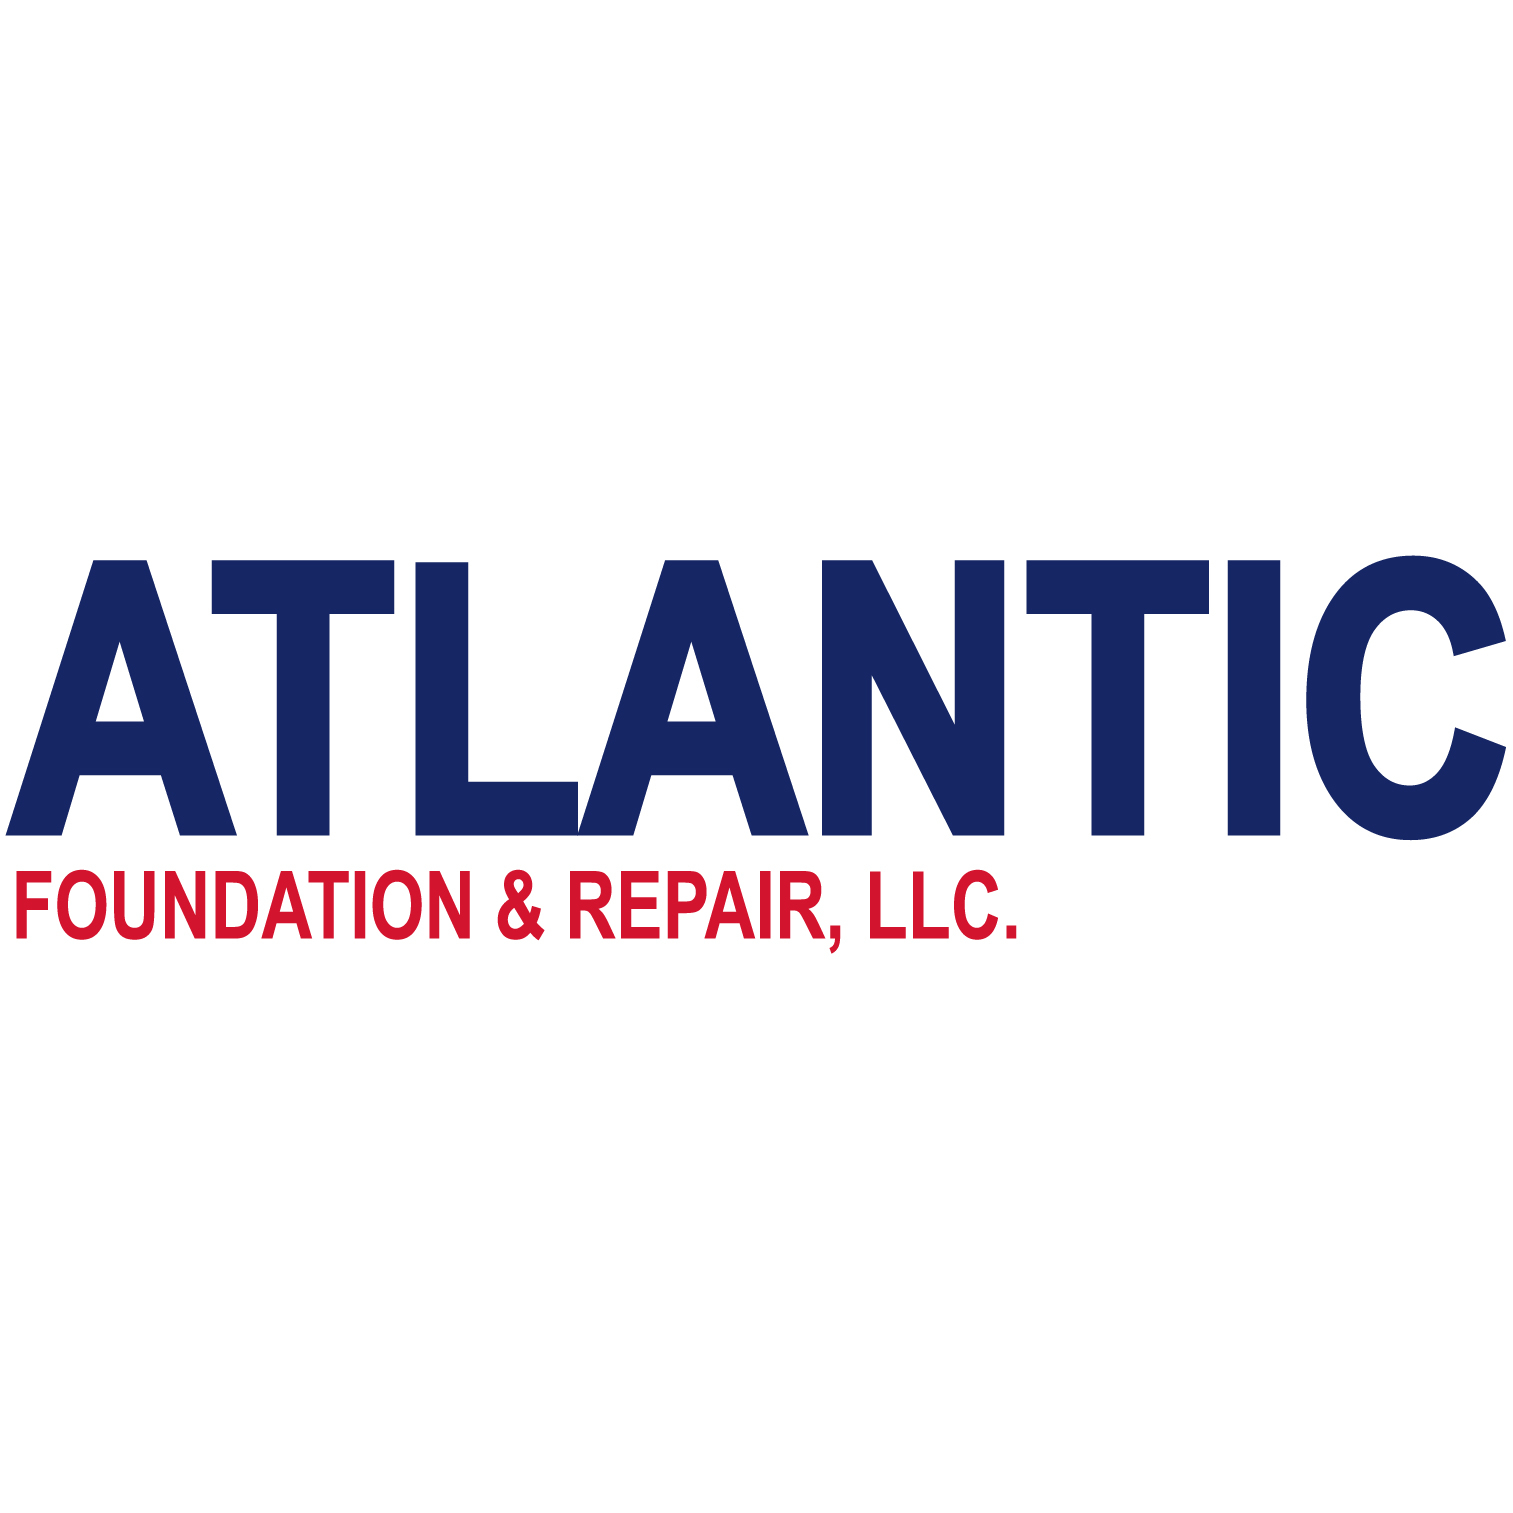 Atlantic Foundation & Repair - Garner, NC - Concrete, Brick & Stone